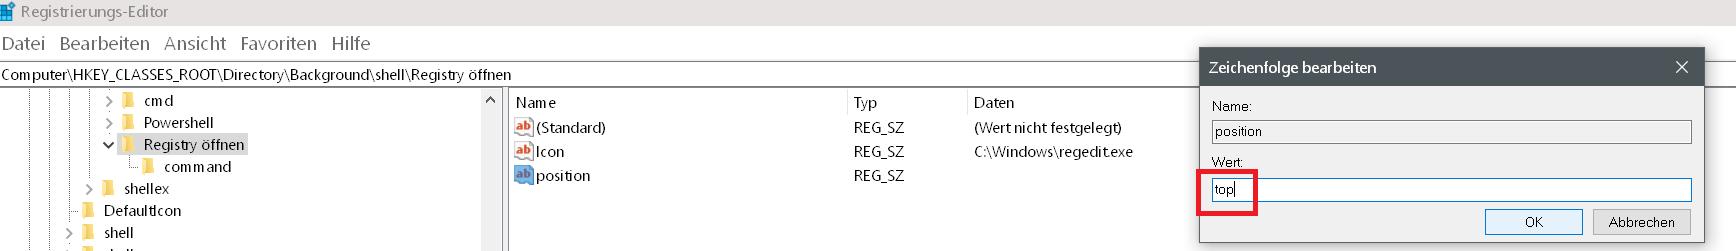 Windows 10 Rechtsklick Kontextmenü erweitern 15